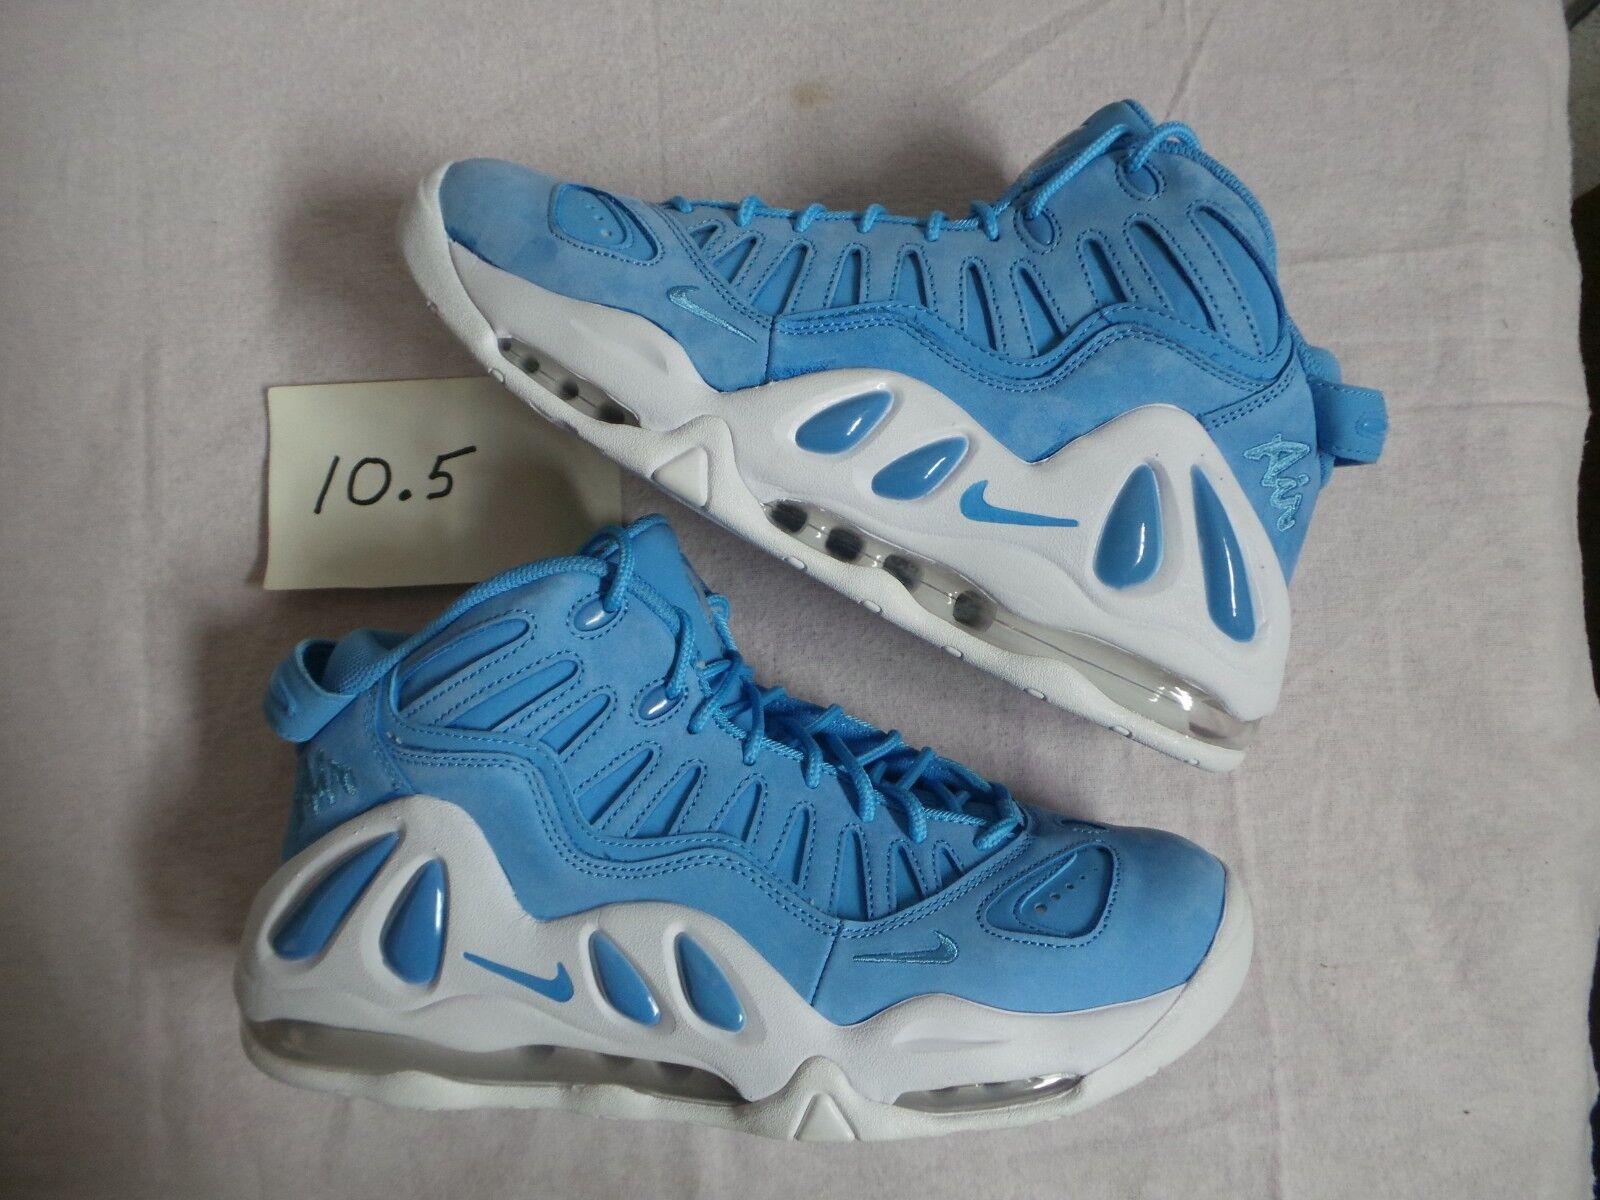 Nike air max ritmo 3 iii 97 97 nord carolina zio la follia di marzo sz 11 s new